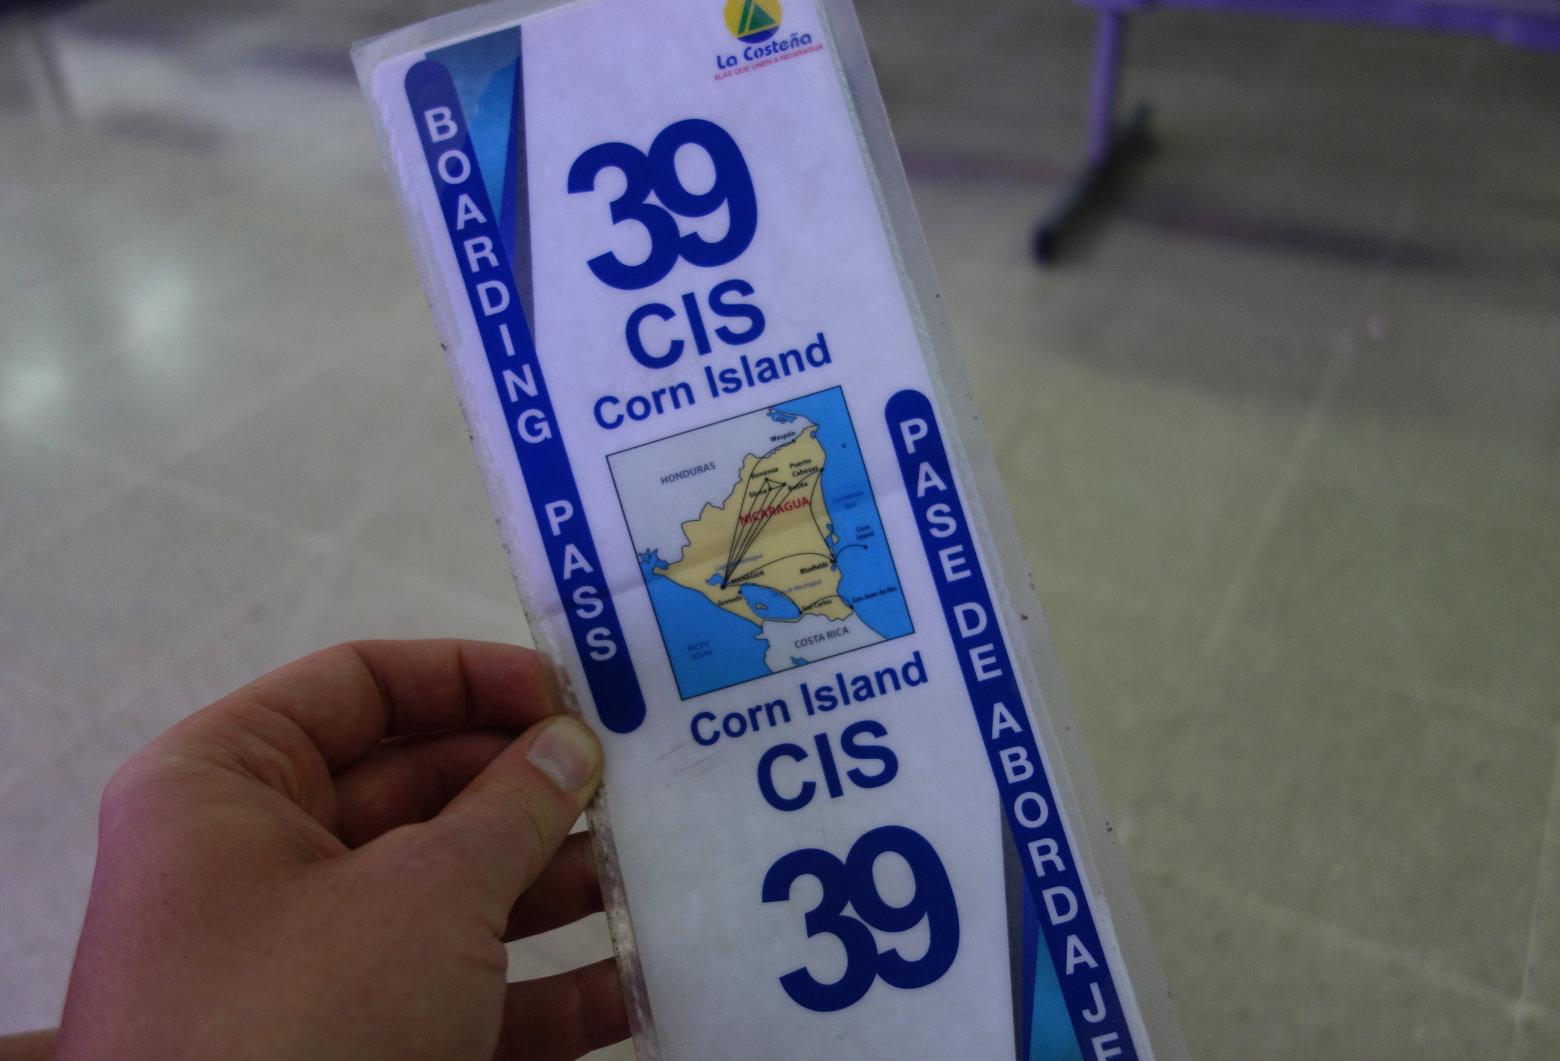 Nicaragua Little Corn Island Anreise Ticket